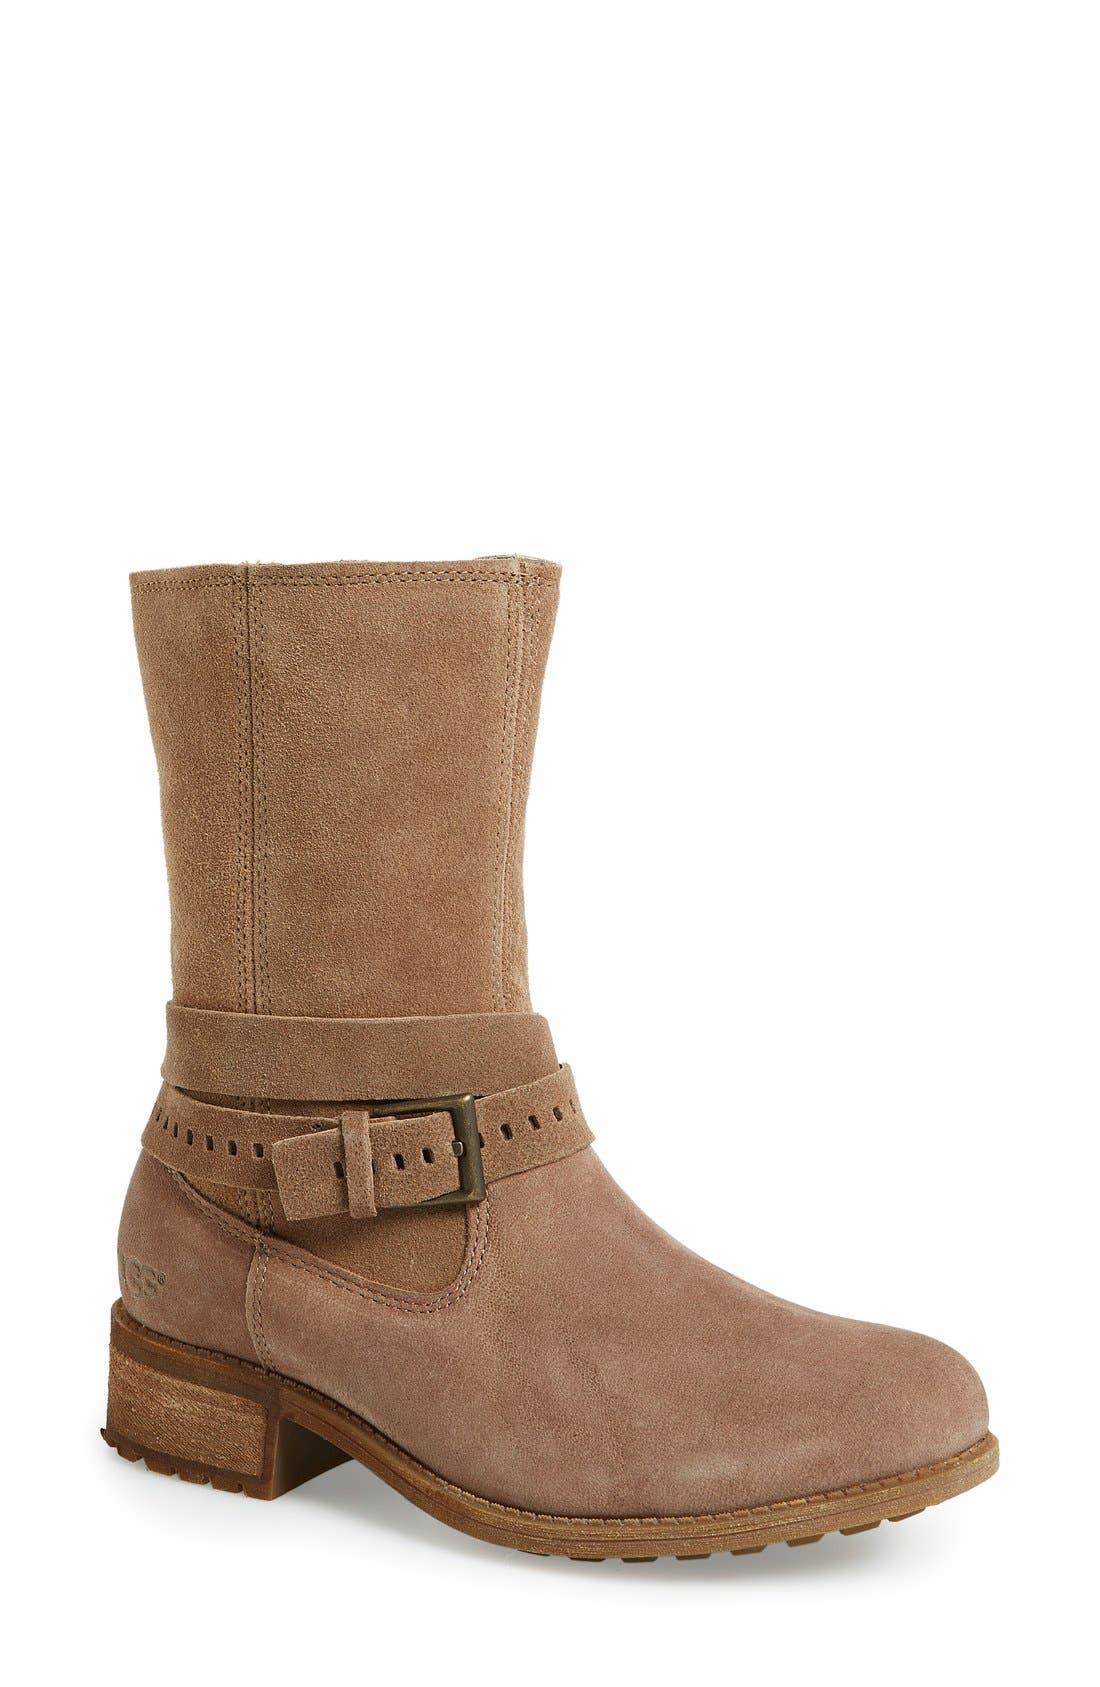 Alternate Image 1 Selected - UGG® Australia 'Kiings' Water Resistant Boot (Women)